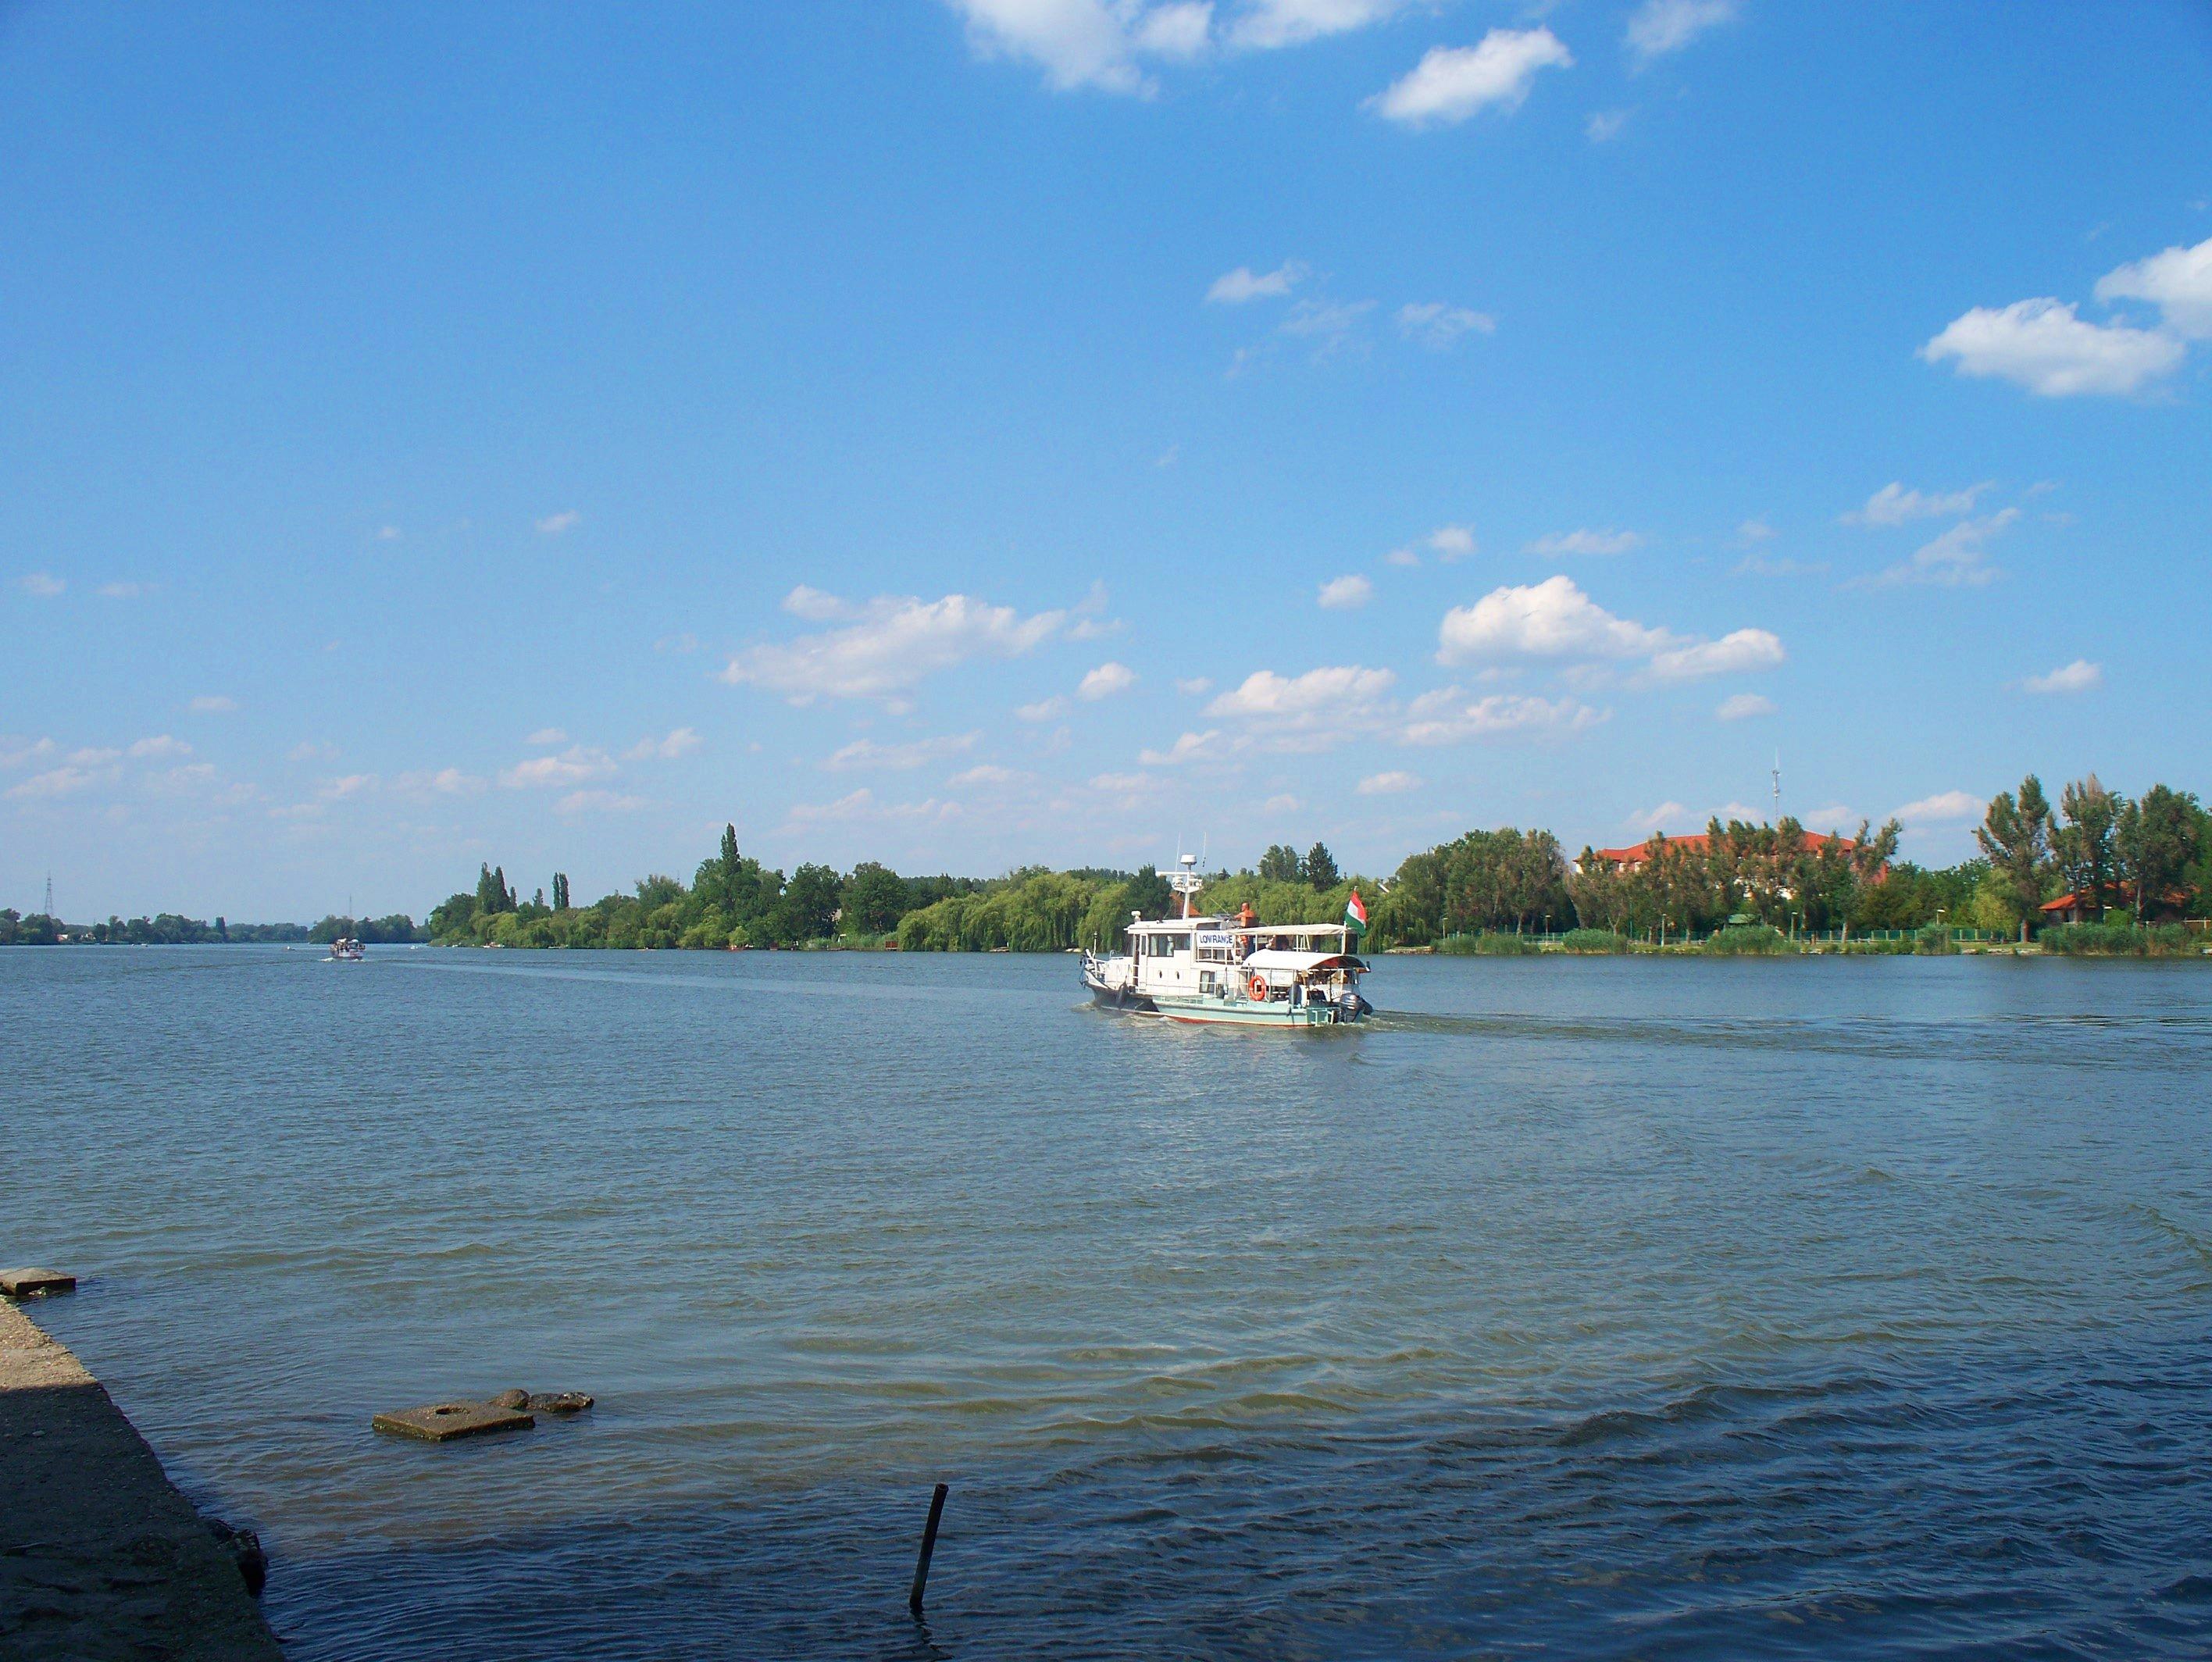 http://www.kisdunainagyhajok.hu/egyebhajok/2012_06_24_maritime_motoros_vontatohajo_a_rackevei-hidnal/2012_06_24_maritime_motoros_vontatohajo_a_rackevei-hidnal_010.jpg